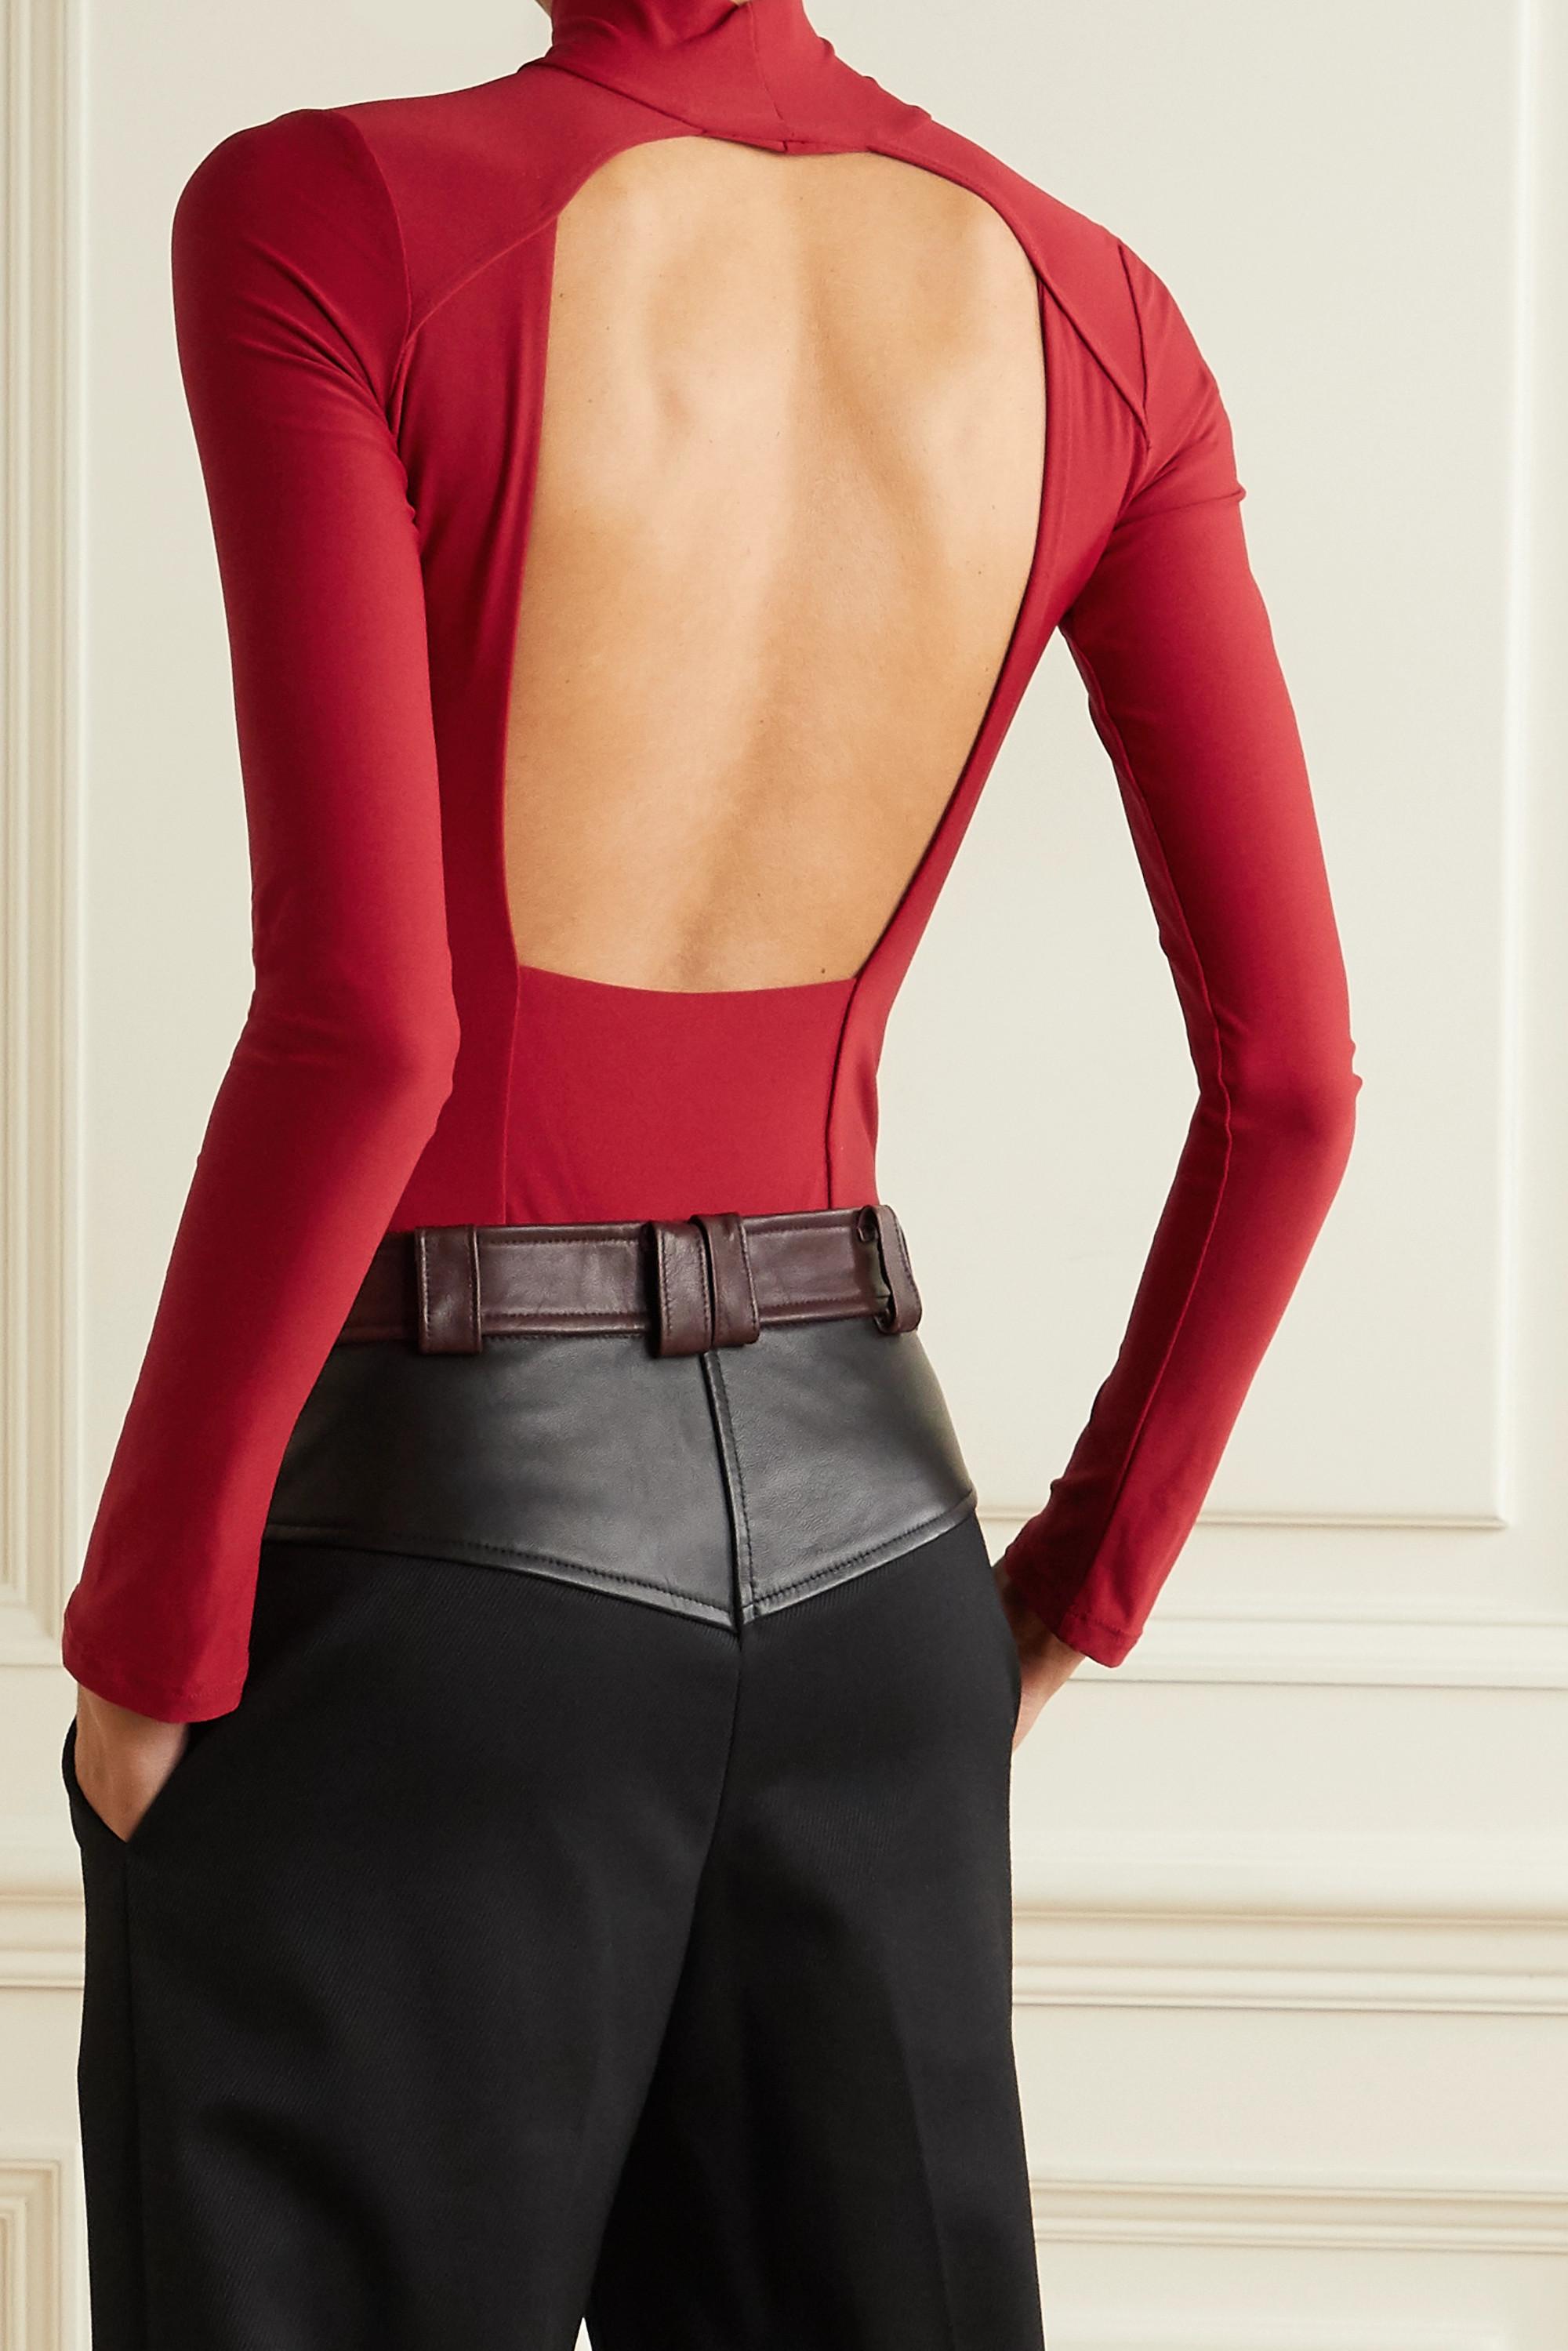 Alix NYC Libby open-back stretch-jersey thong bodysuit